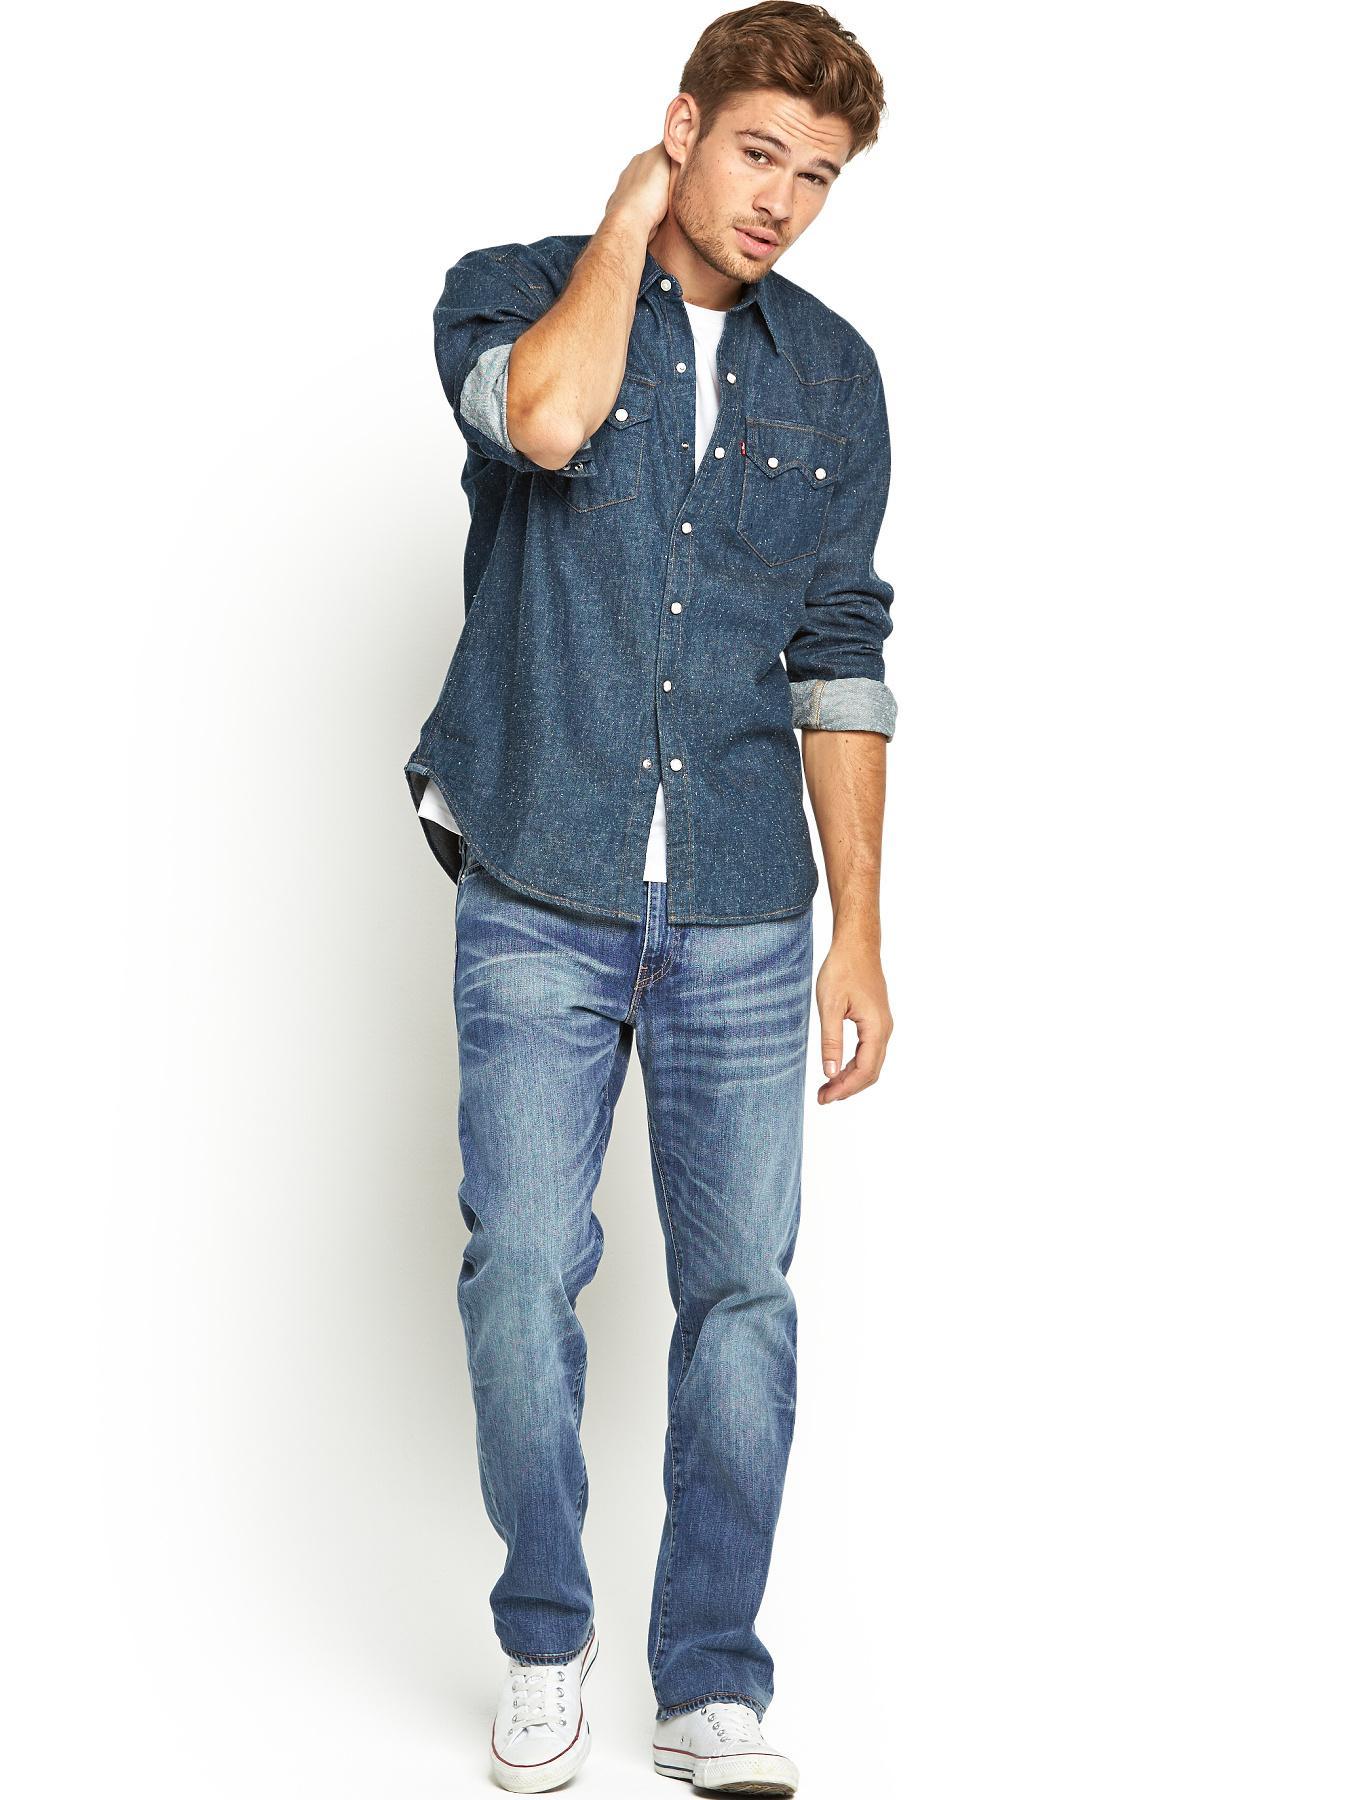 levis 513 slim straight jeans for men